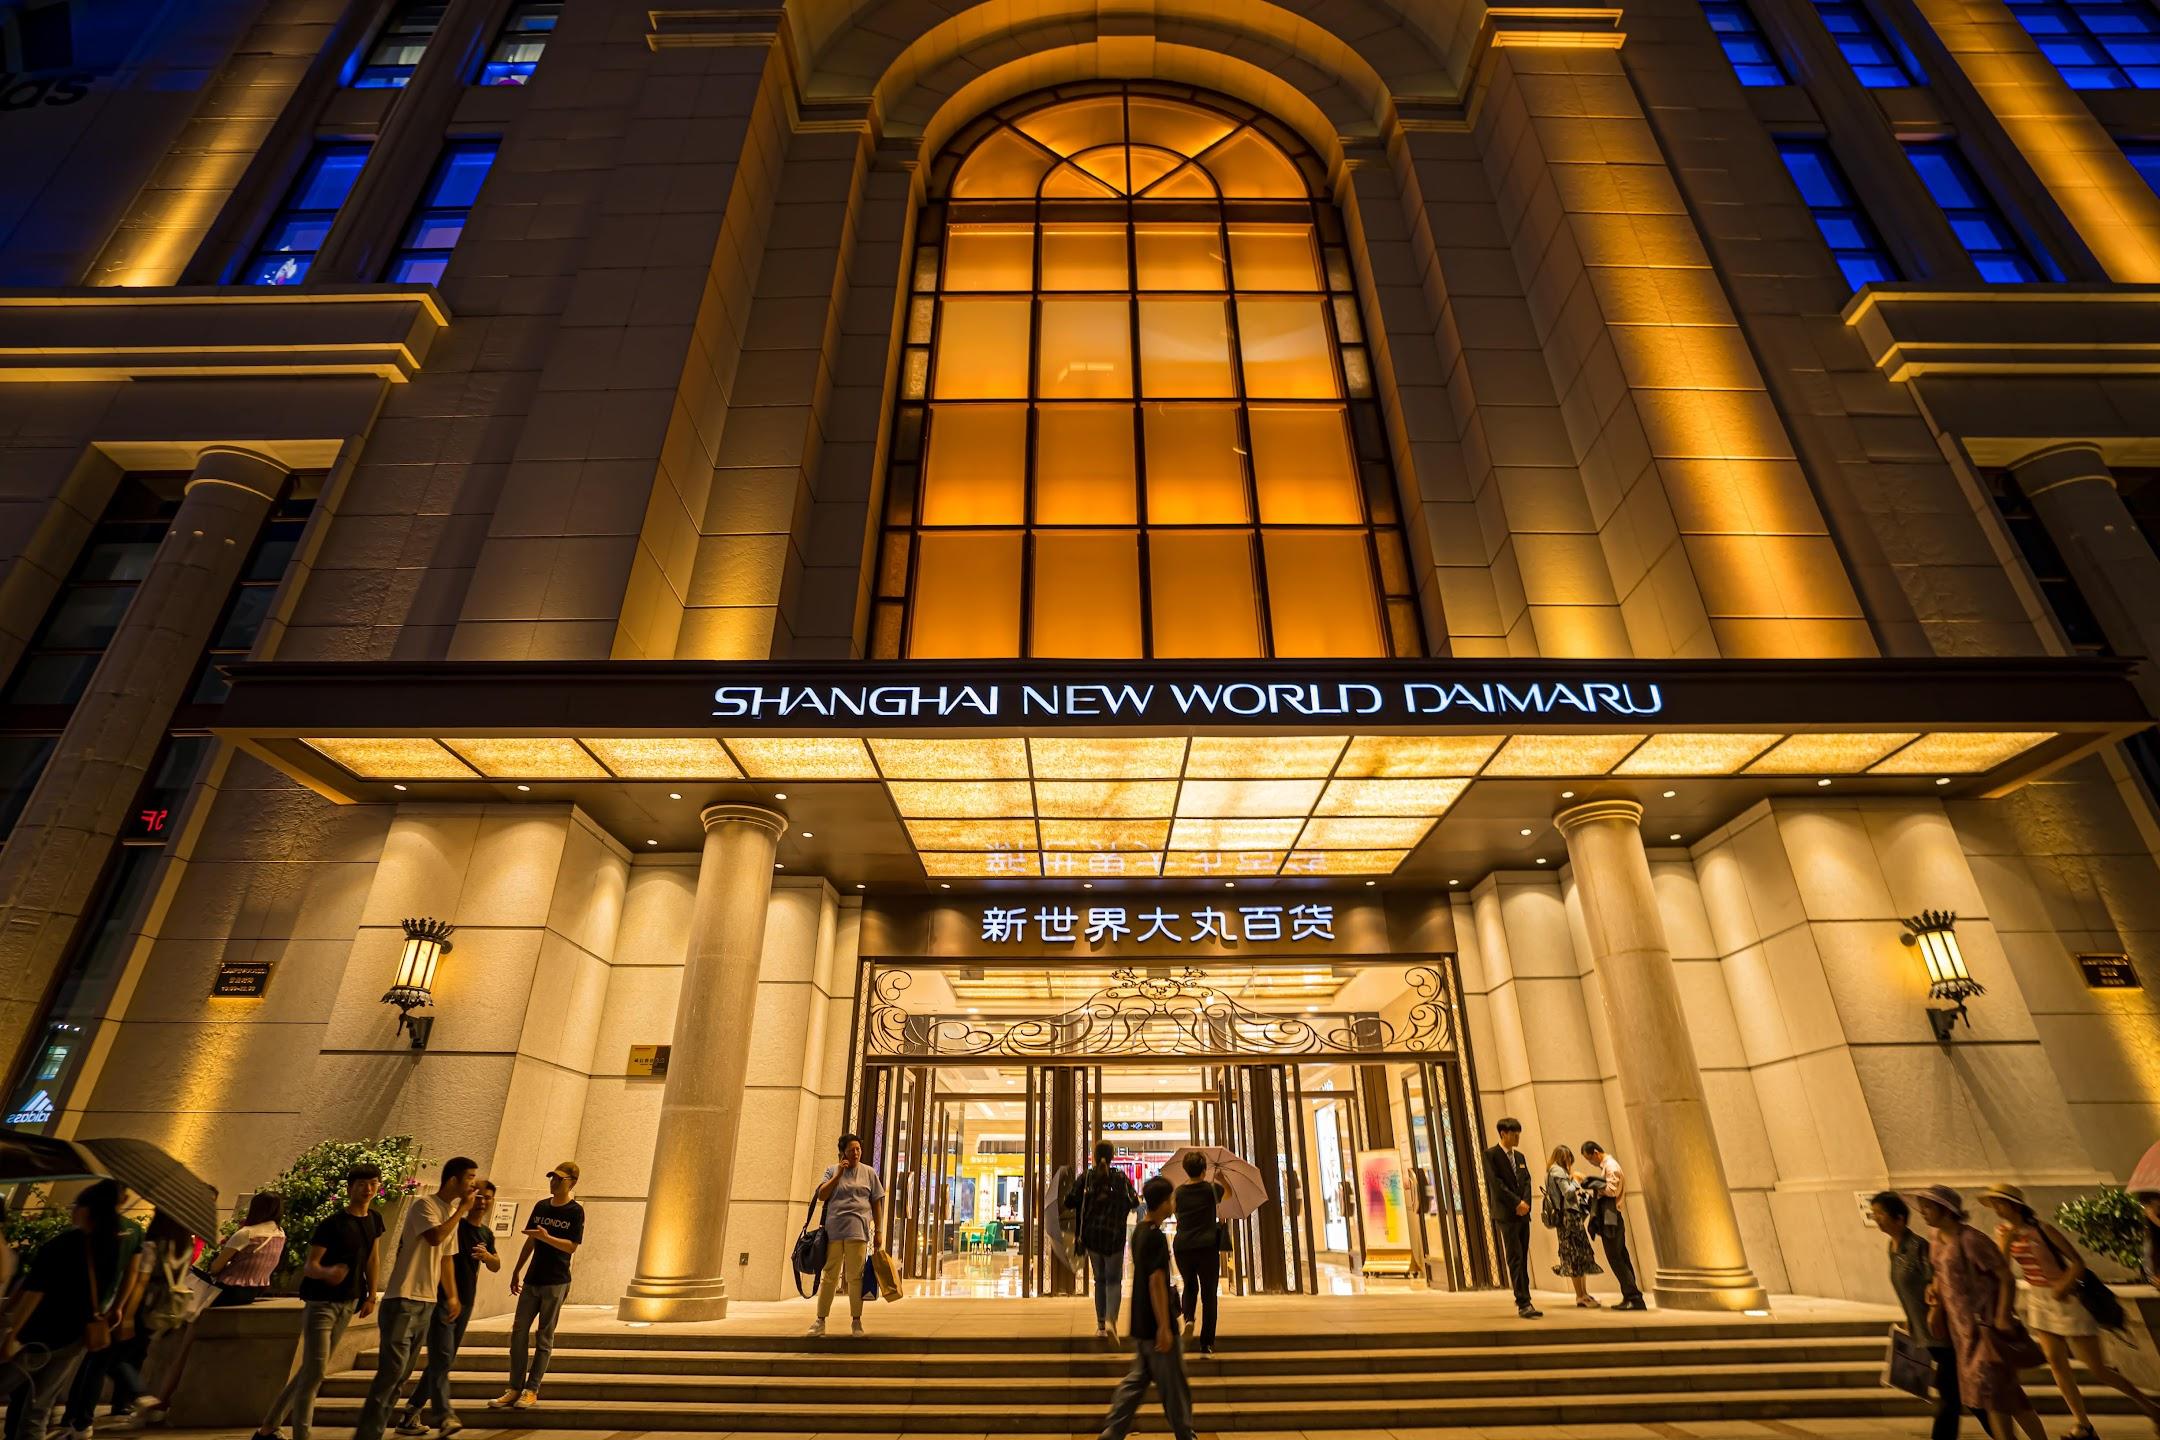 上海 新世界大丸百貨 (Shanghai New World DAIMARU)